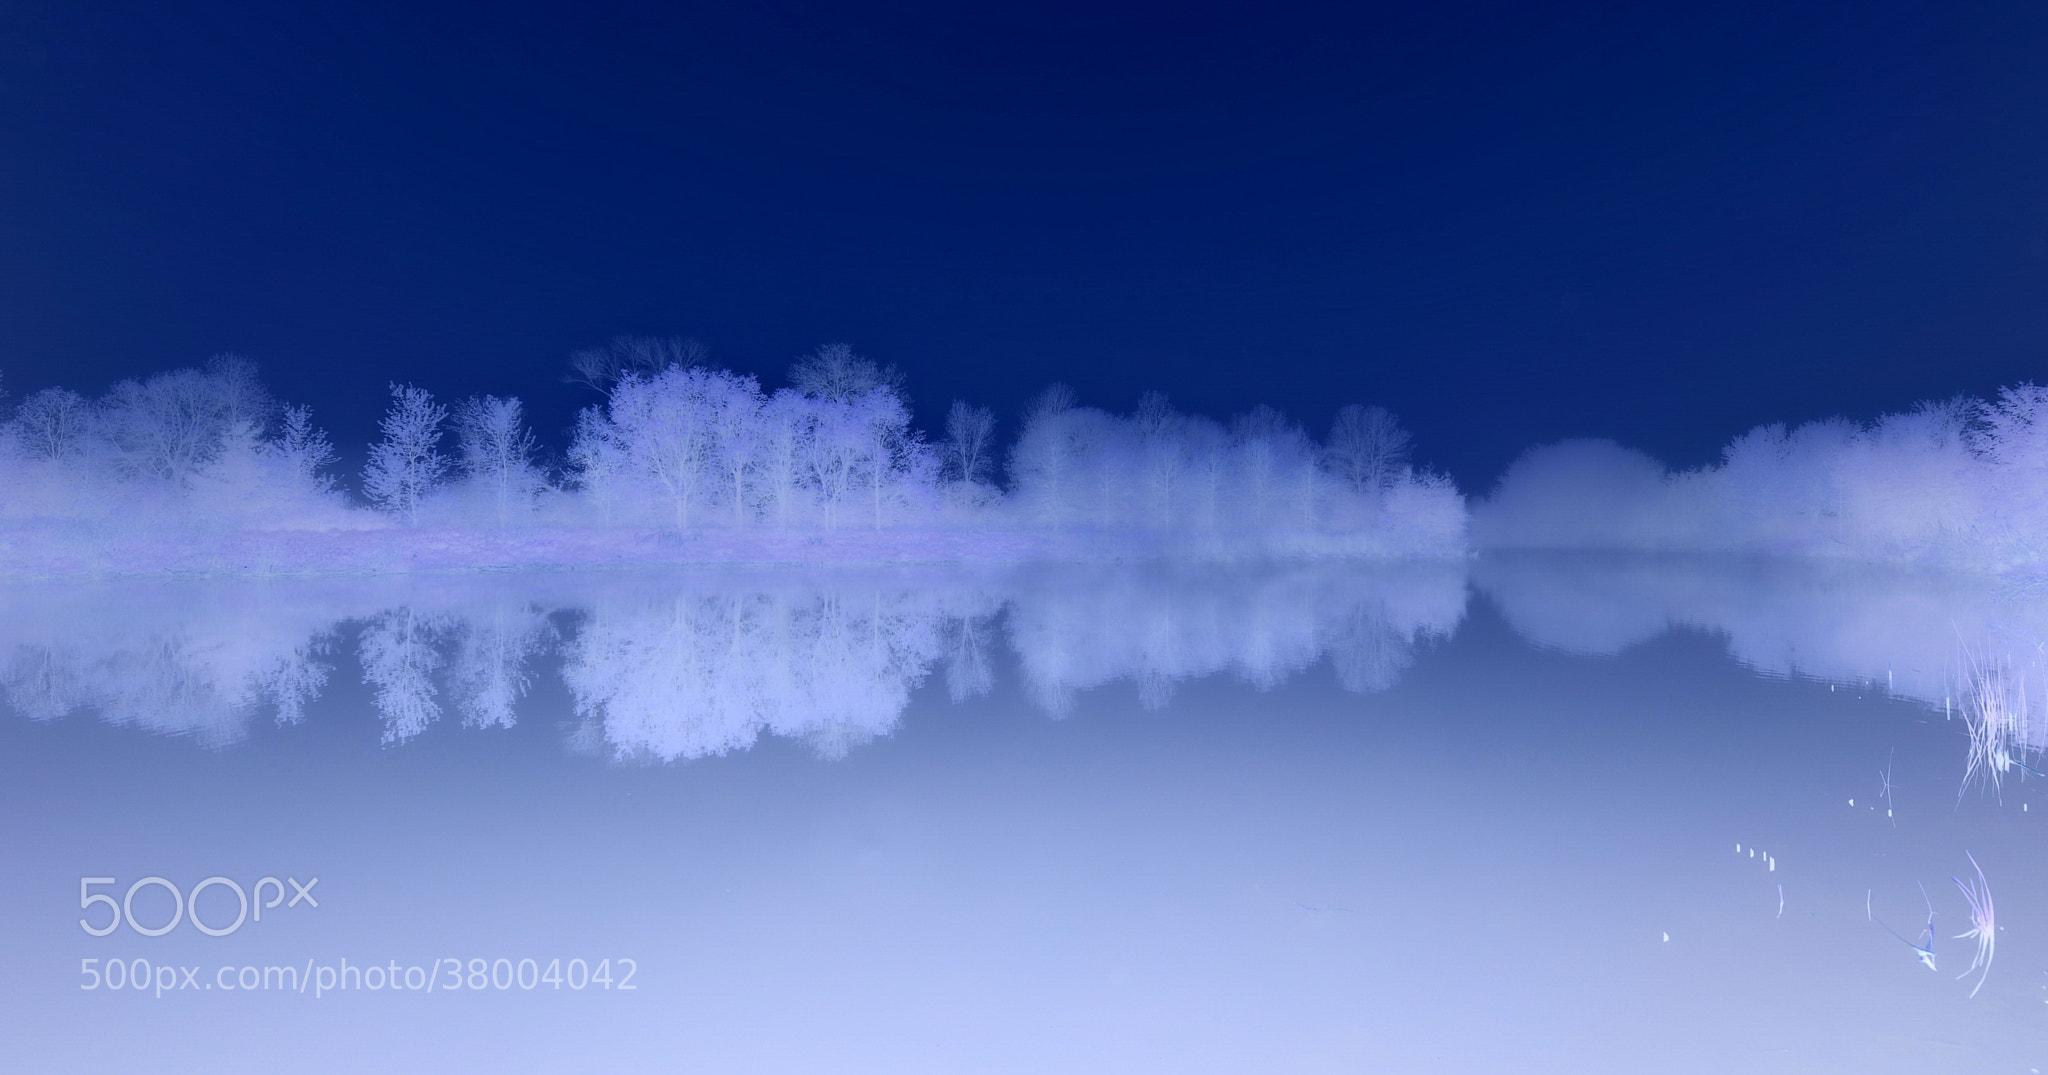 Photograph Frosty Fantasy by AZ Imaging on 500px